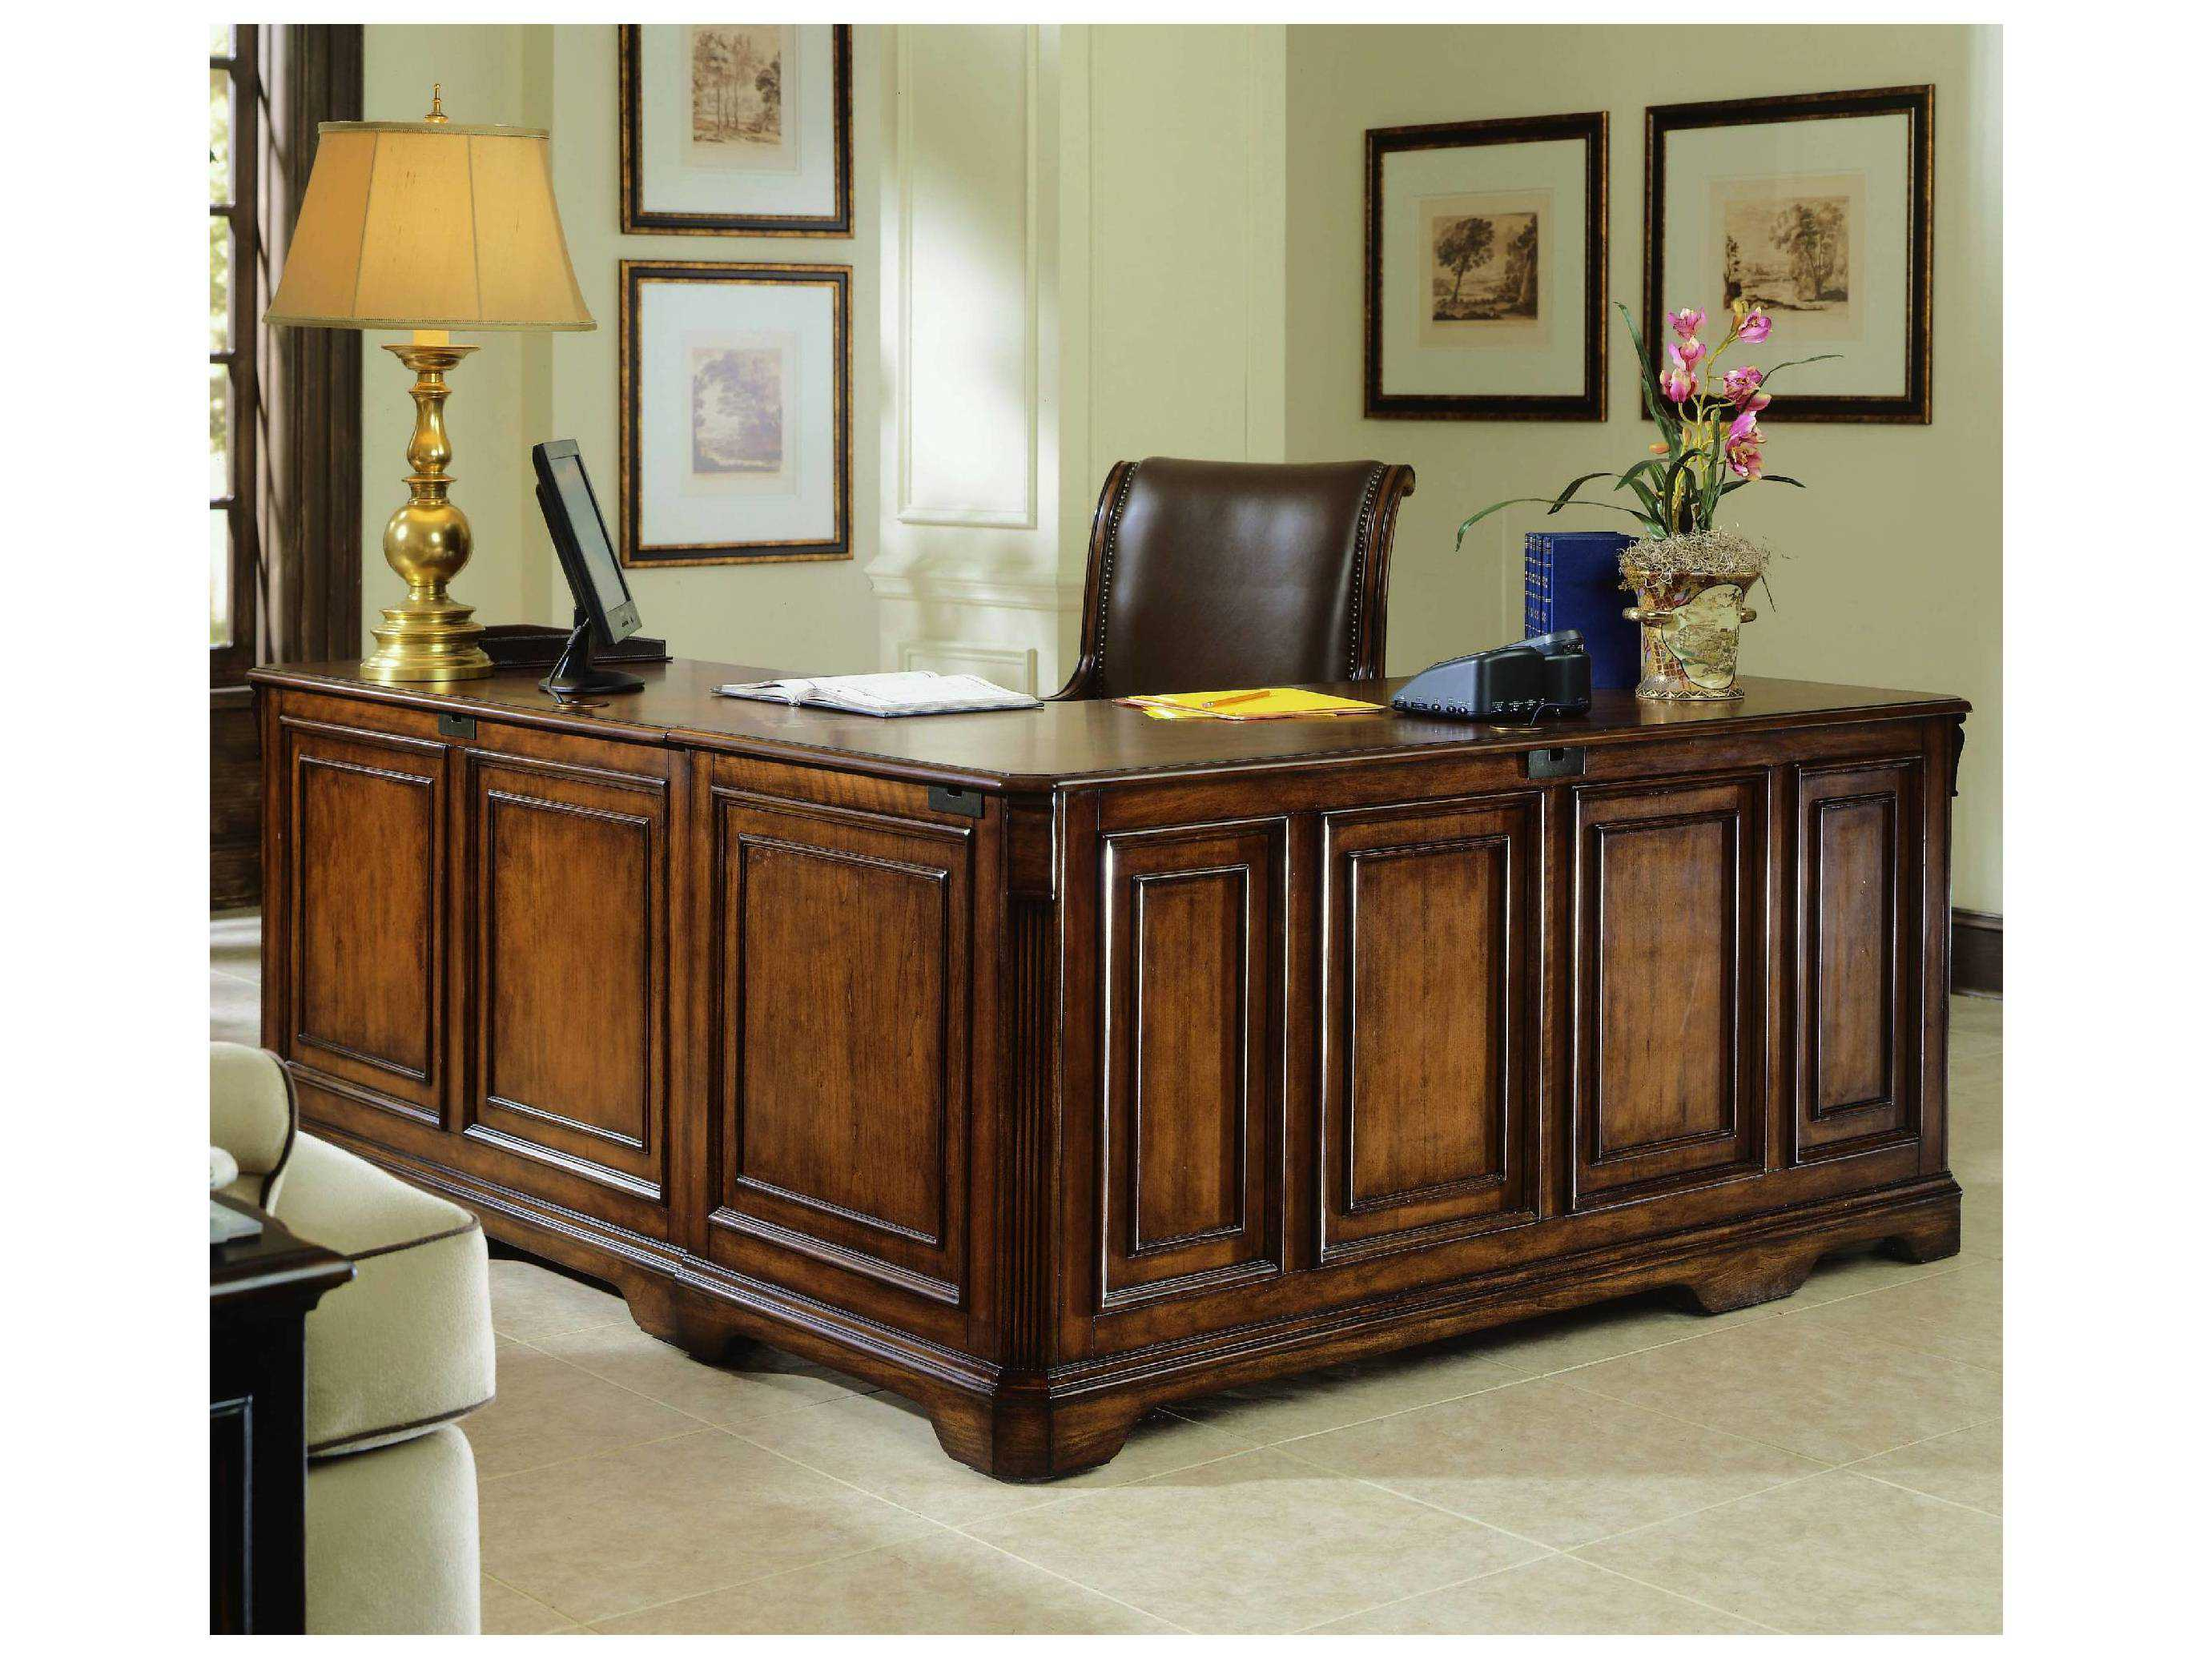 Hooker Furniture Brookhaven Distressed Medium Cherry 68 39 39 L